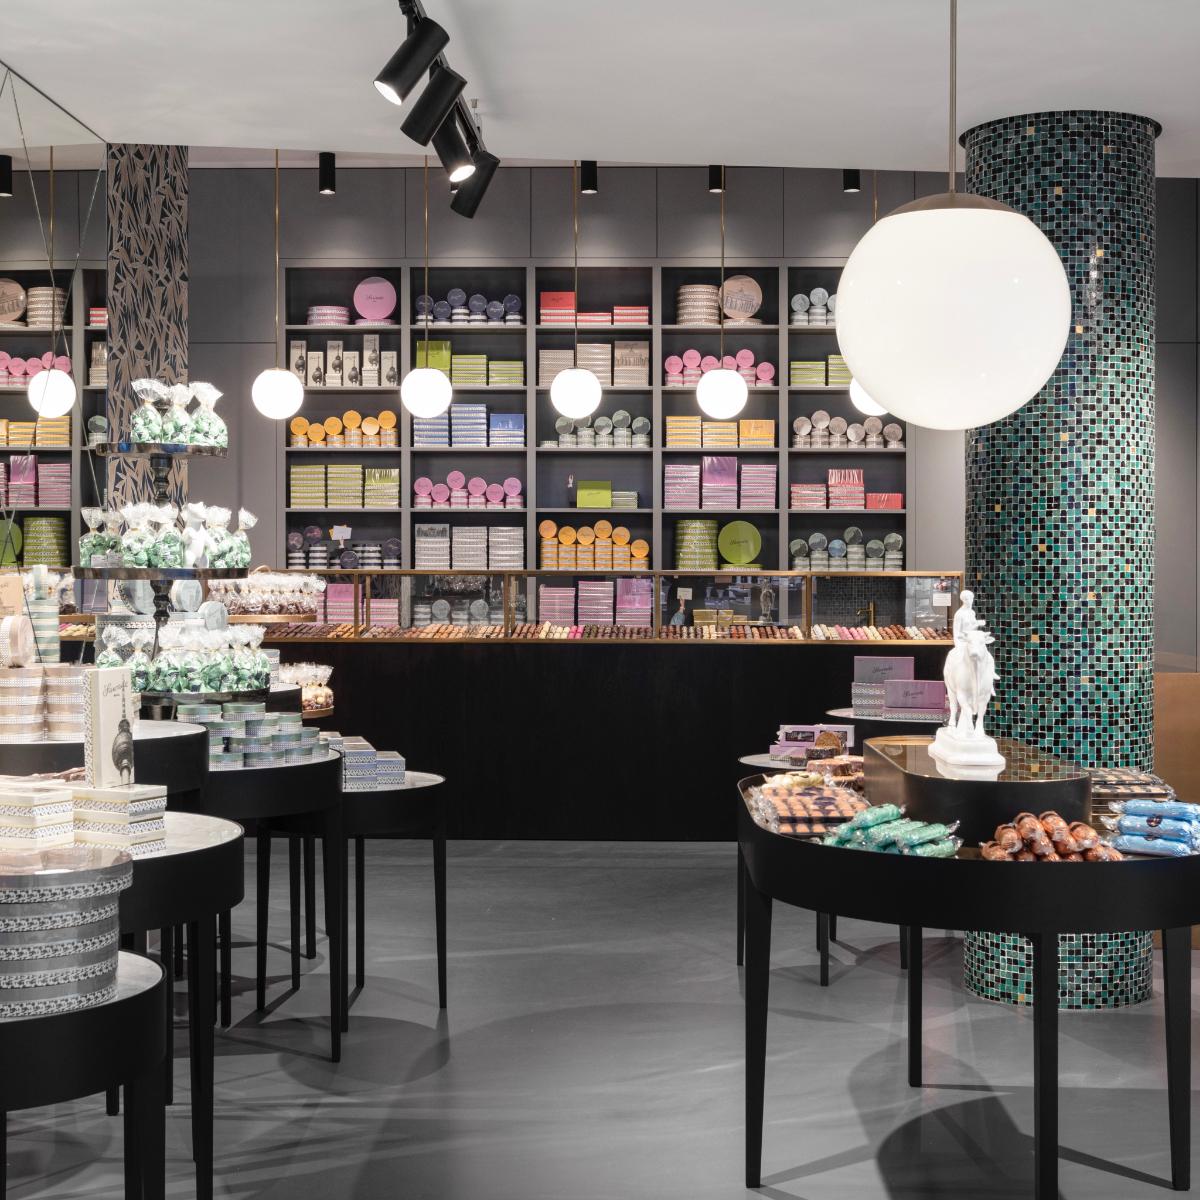 Sawade Shop Kurfuerstendamm  I Foto Jordana Schramm  (1)